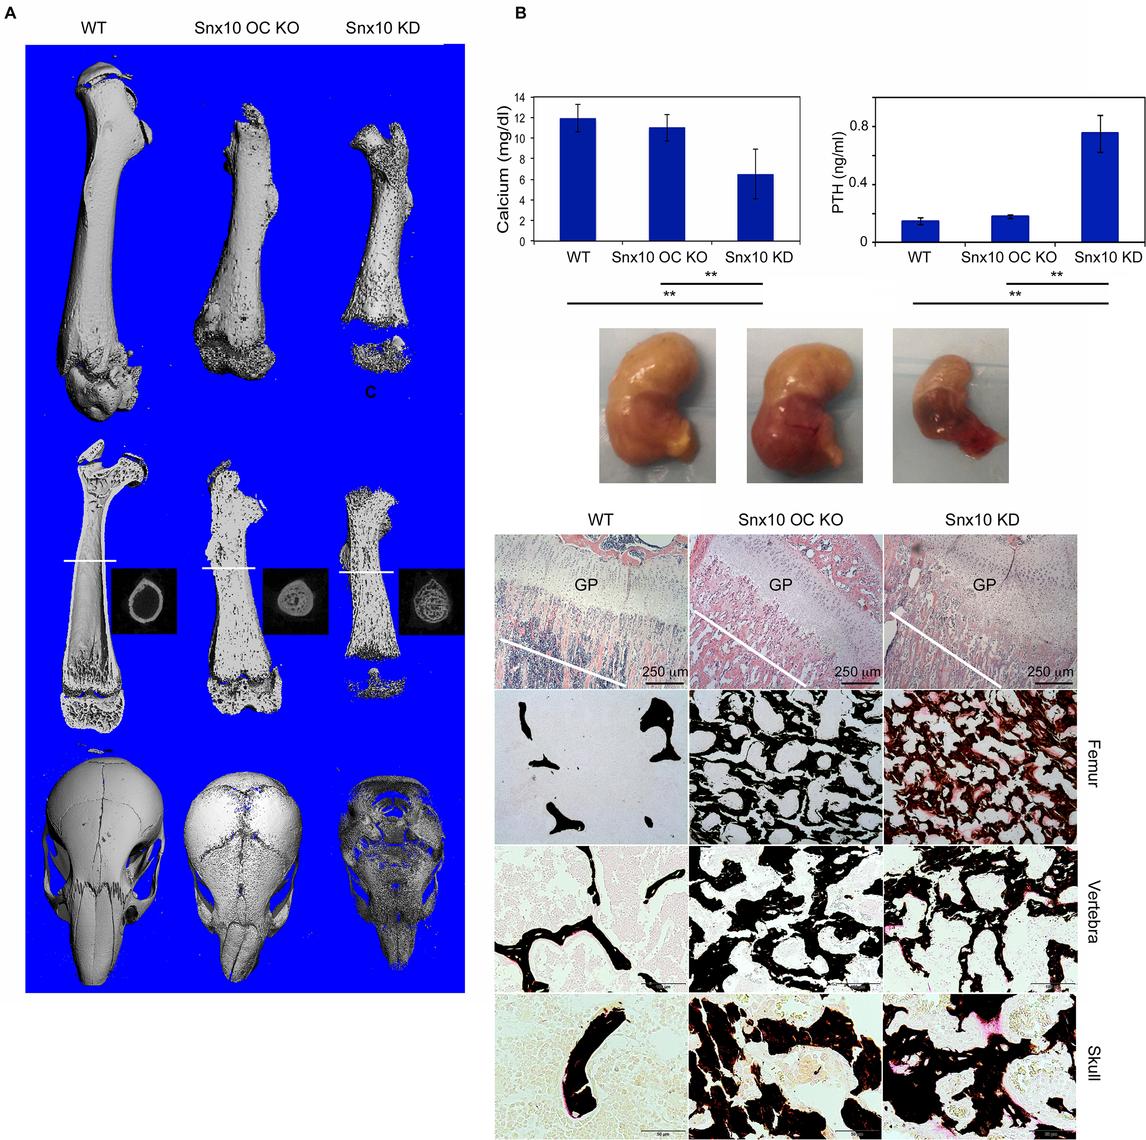 Histology and Micro CT analysis of Snx10 OC KO mice.